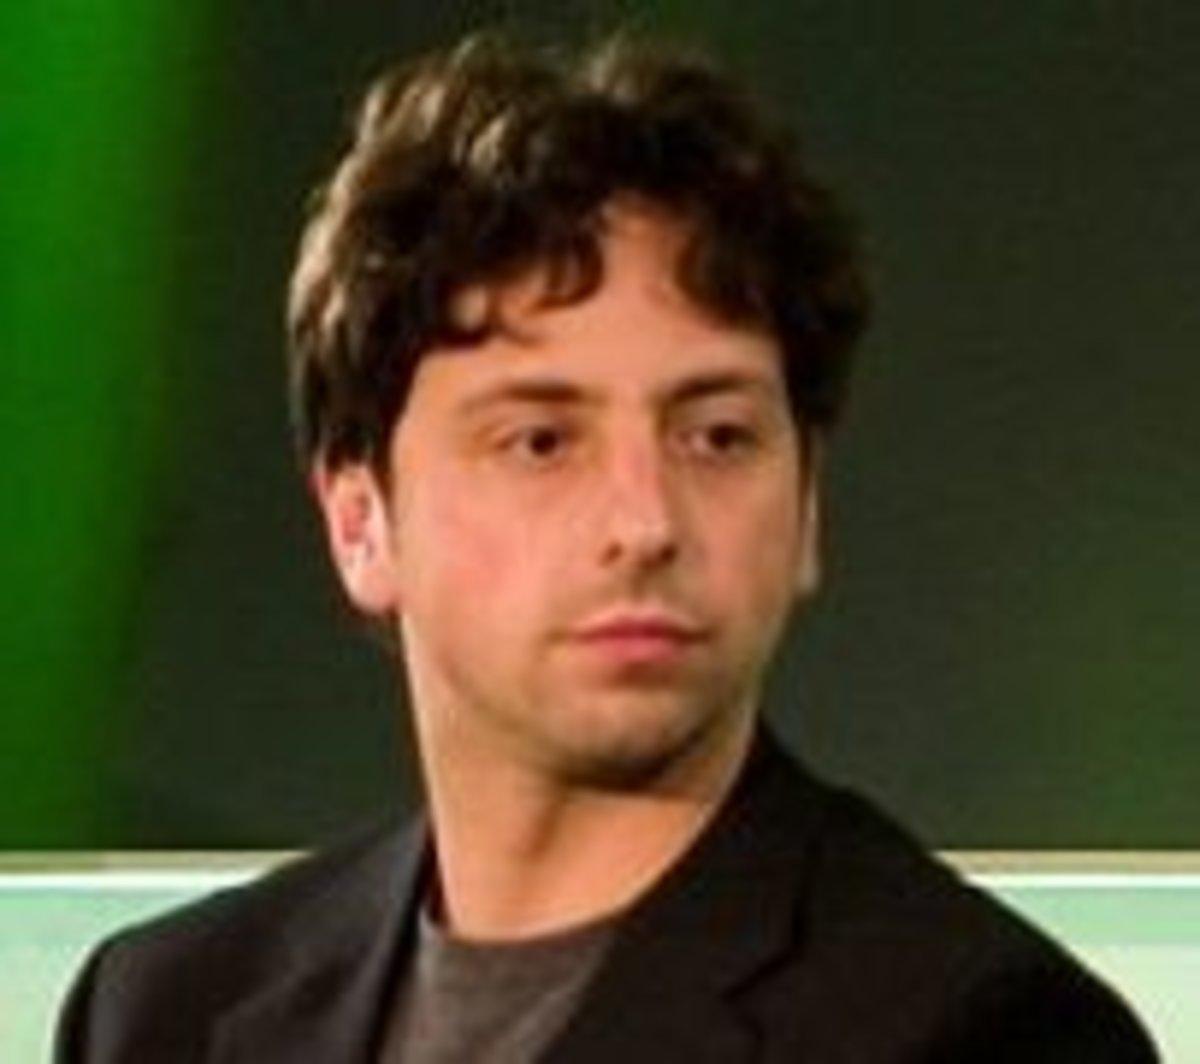 Sergey Brin, co-founder of Google.com